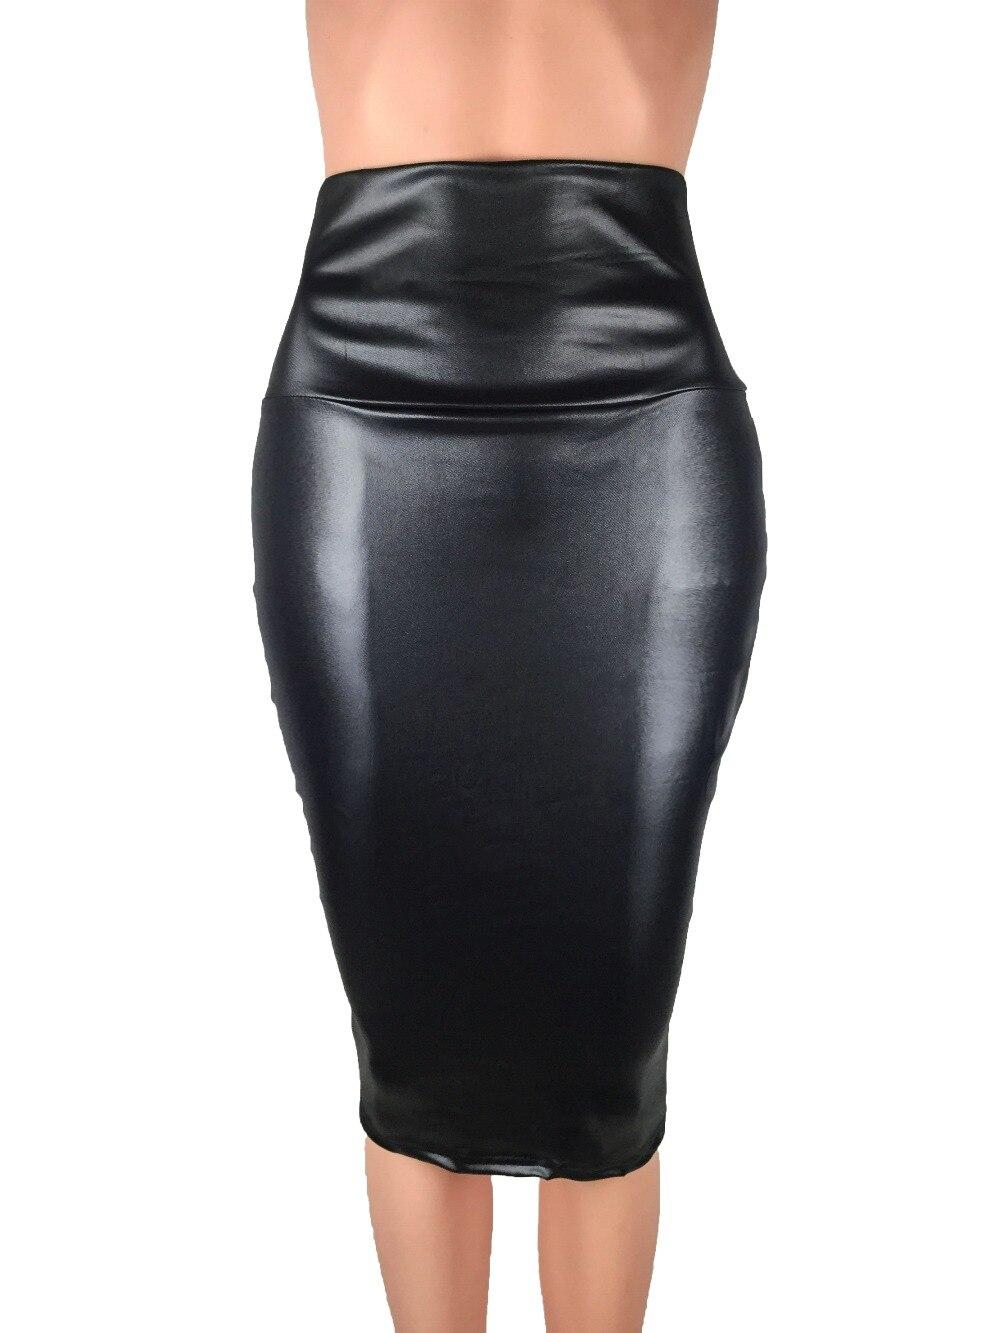 Bohocotol 19 pencil faux leather skirt women casual plus size clothing chic elegant sexy fitness black midi pencil skirts 1